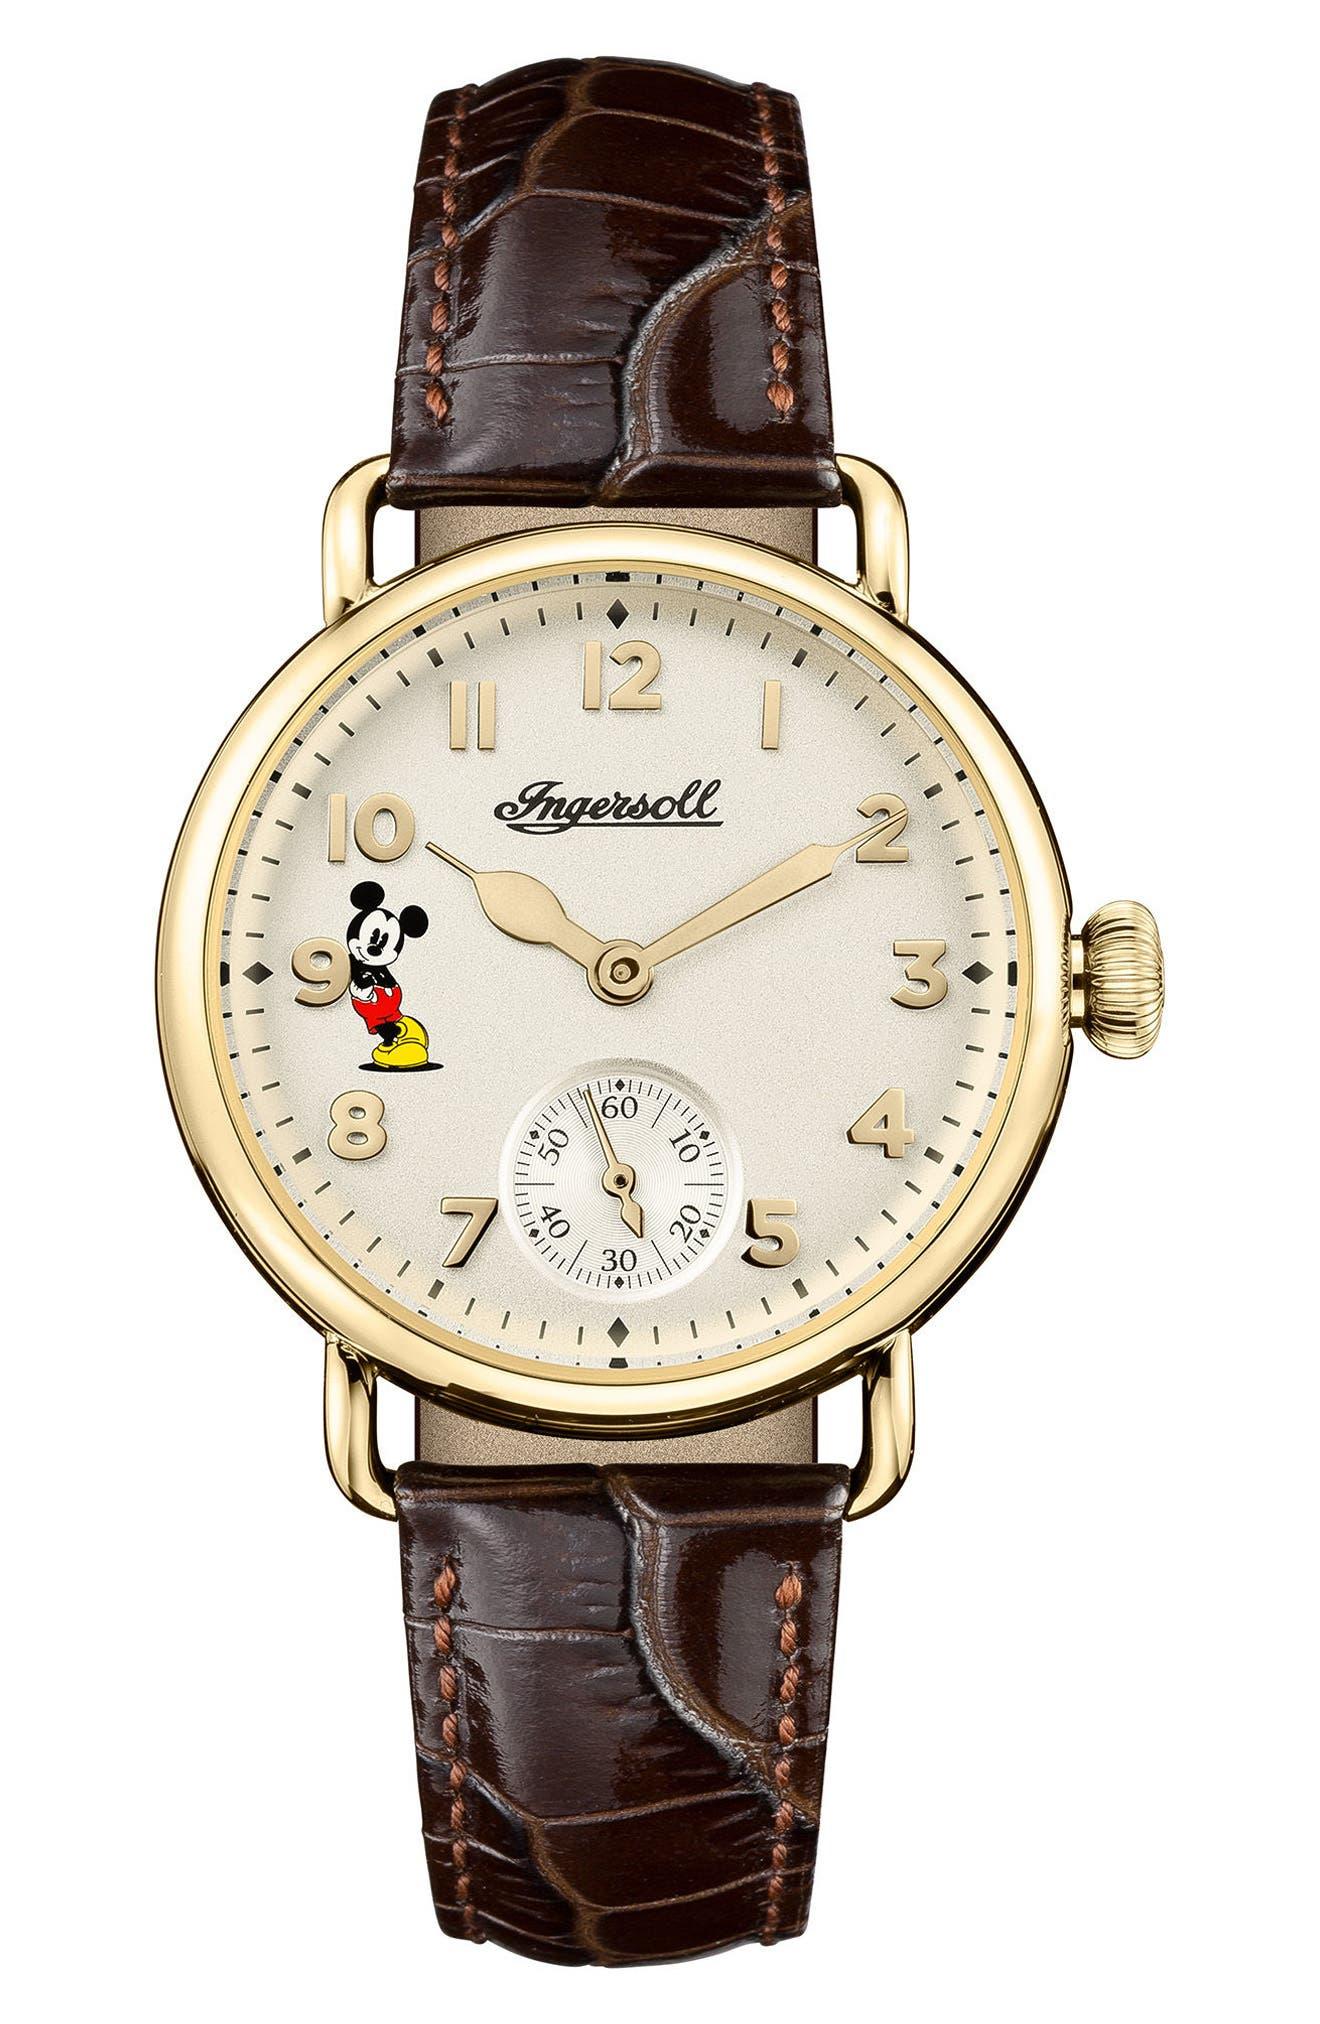 Main Image - Ingersoll Trenton Disney Leather Strap Watch, 31mm